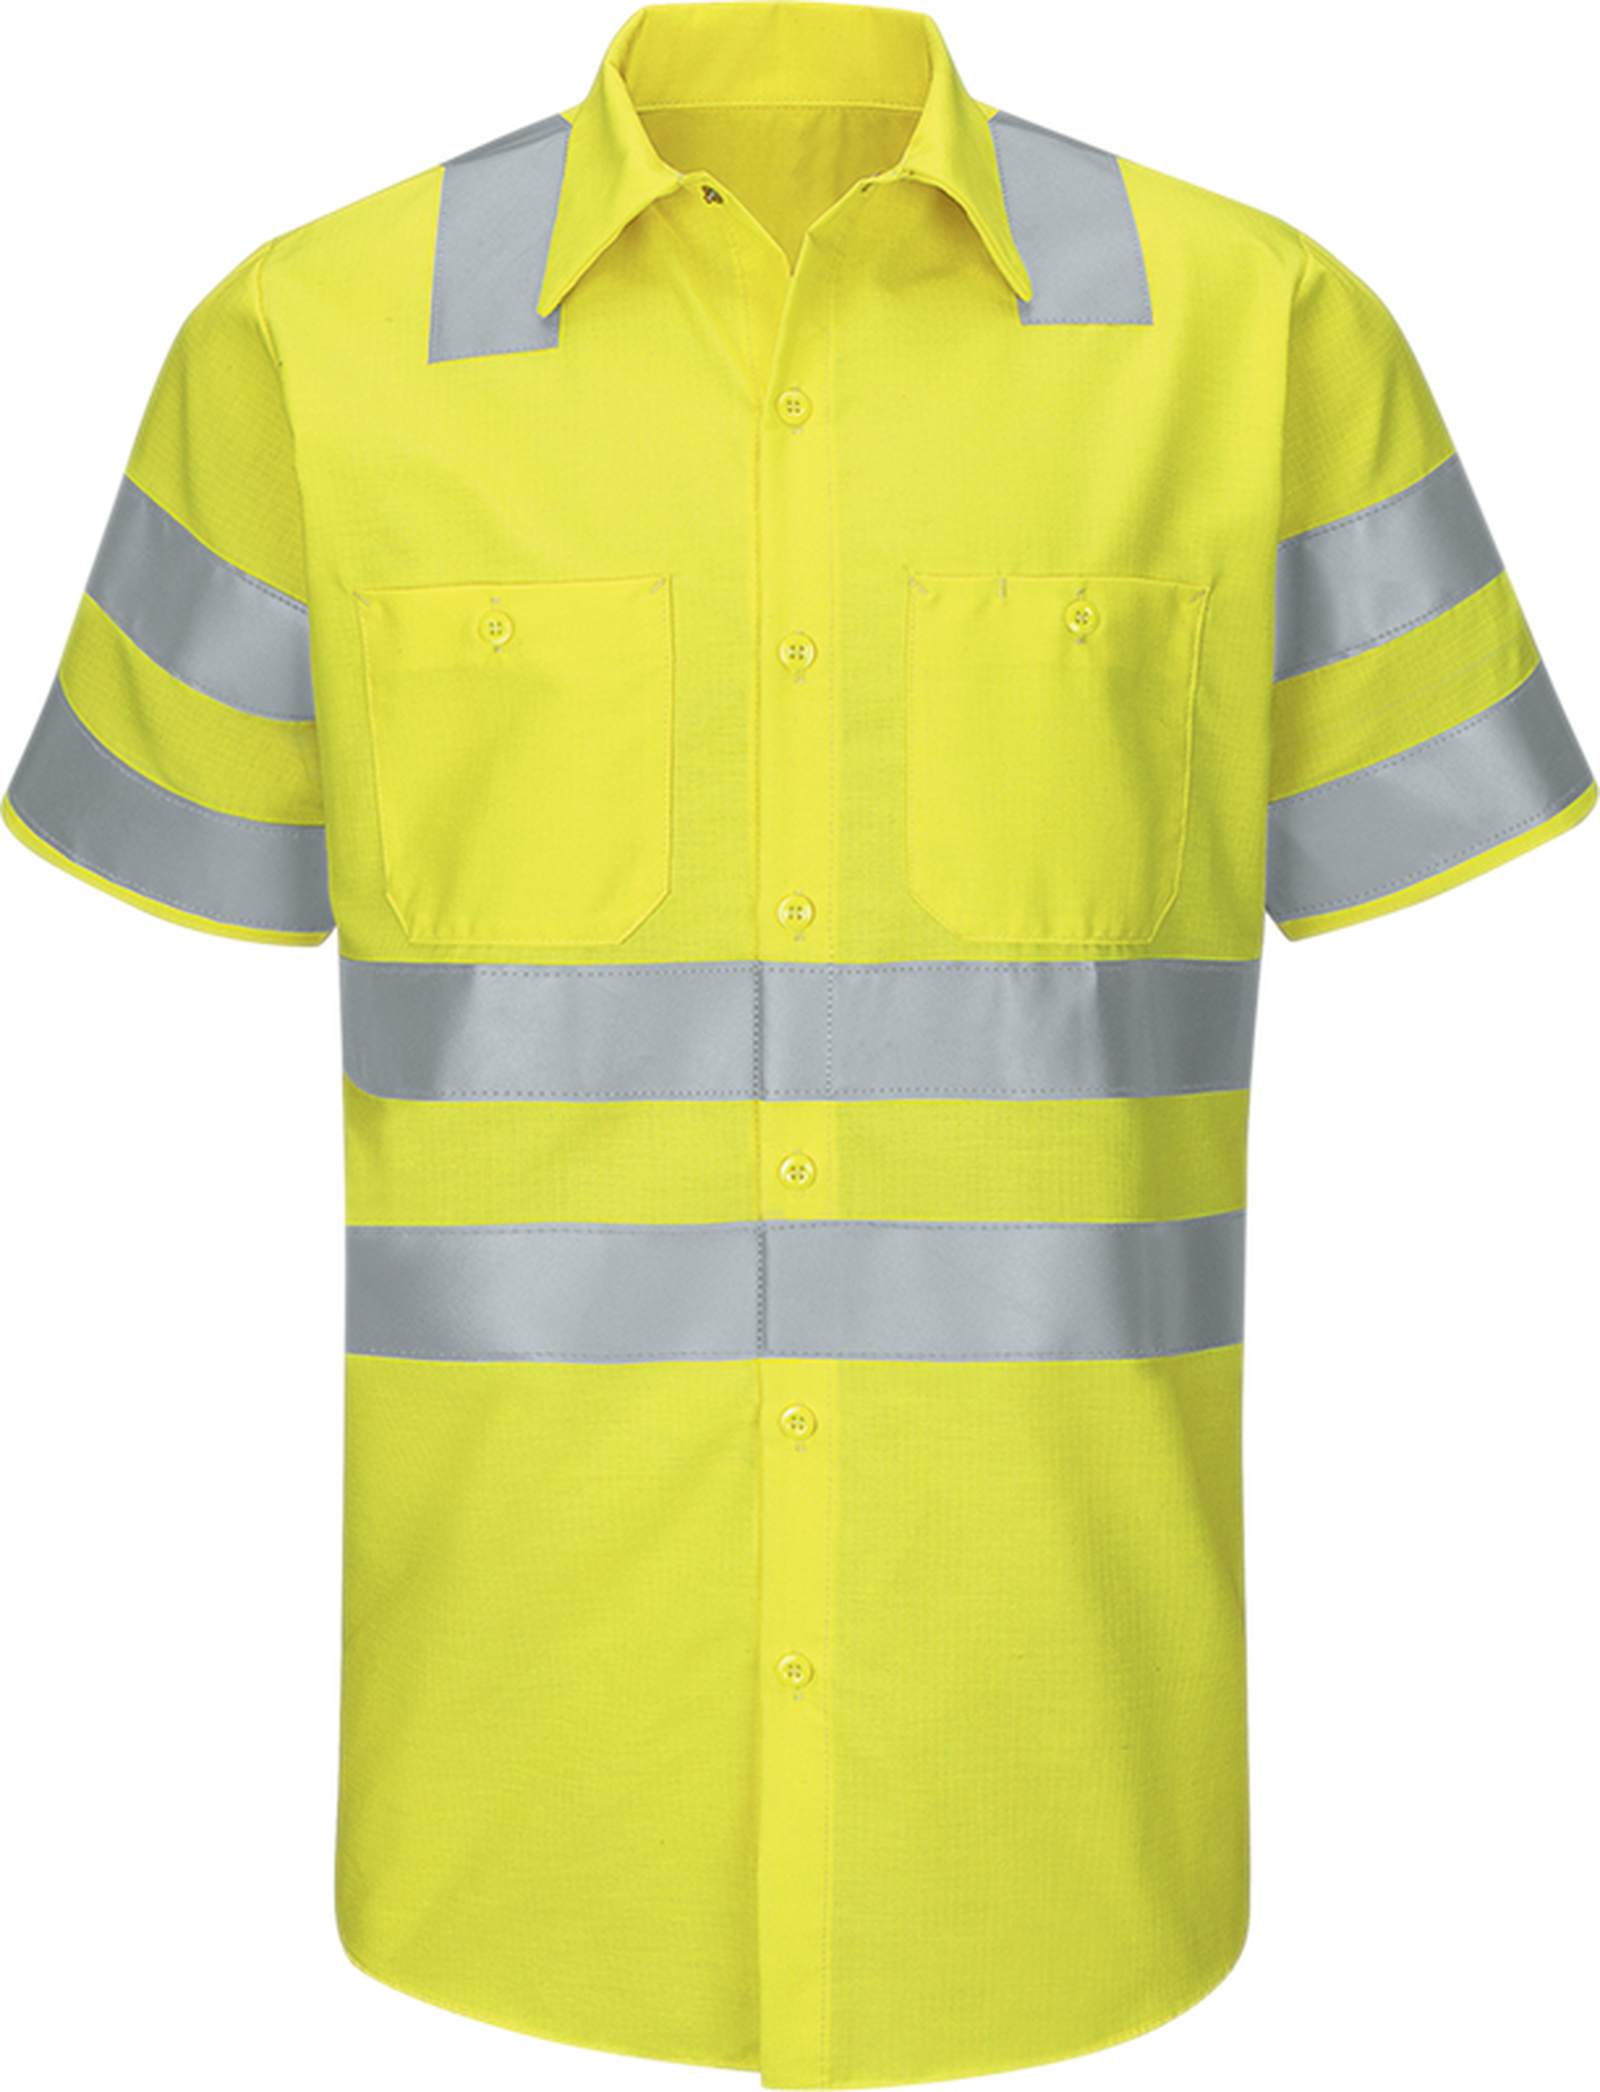 Men's Hi-Visibility Short Sleeve Ripstop Work Shirt - Type R, Class 3